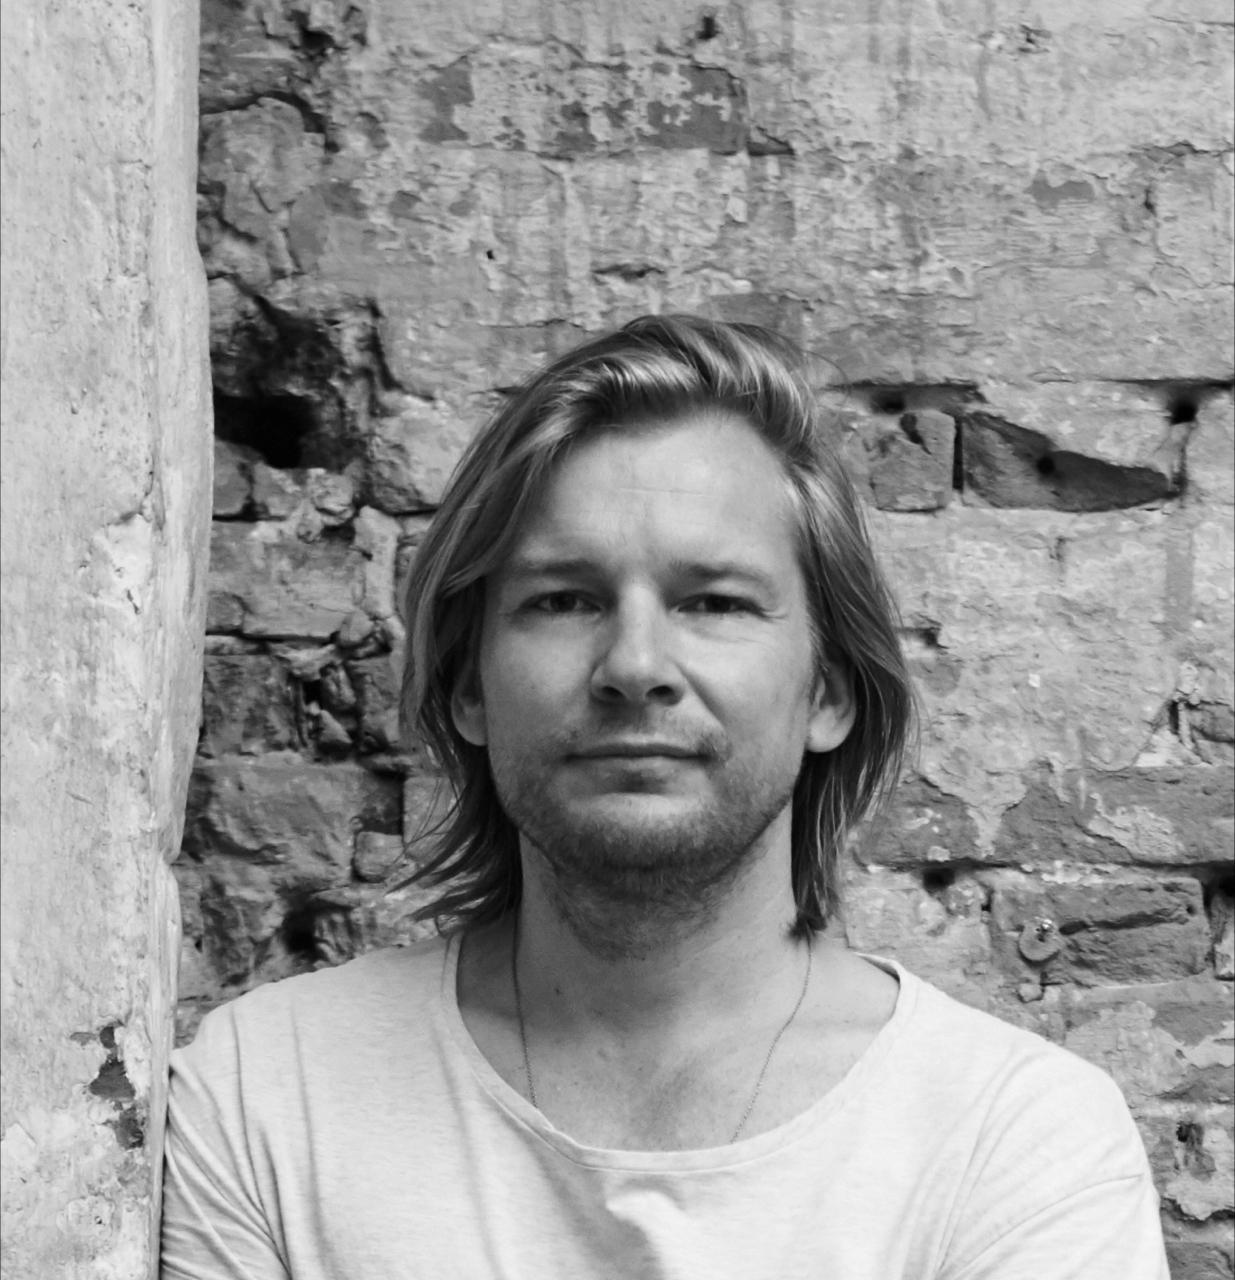 Peter Fehrentz